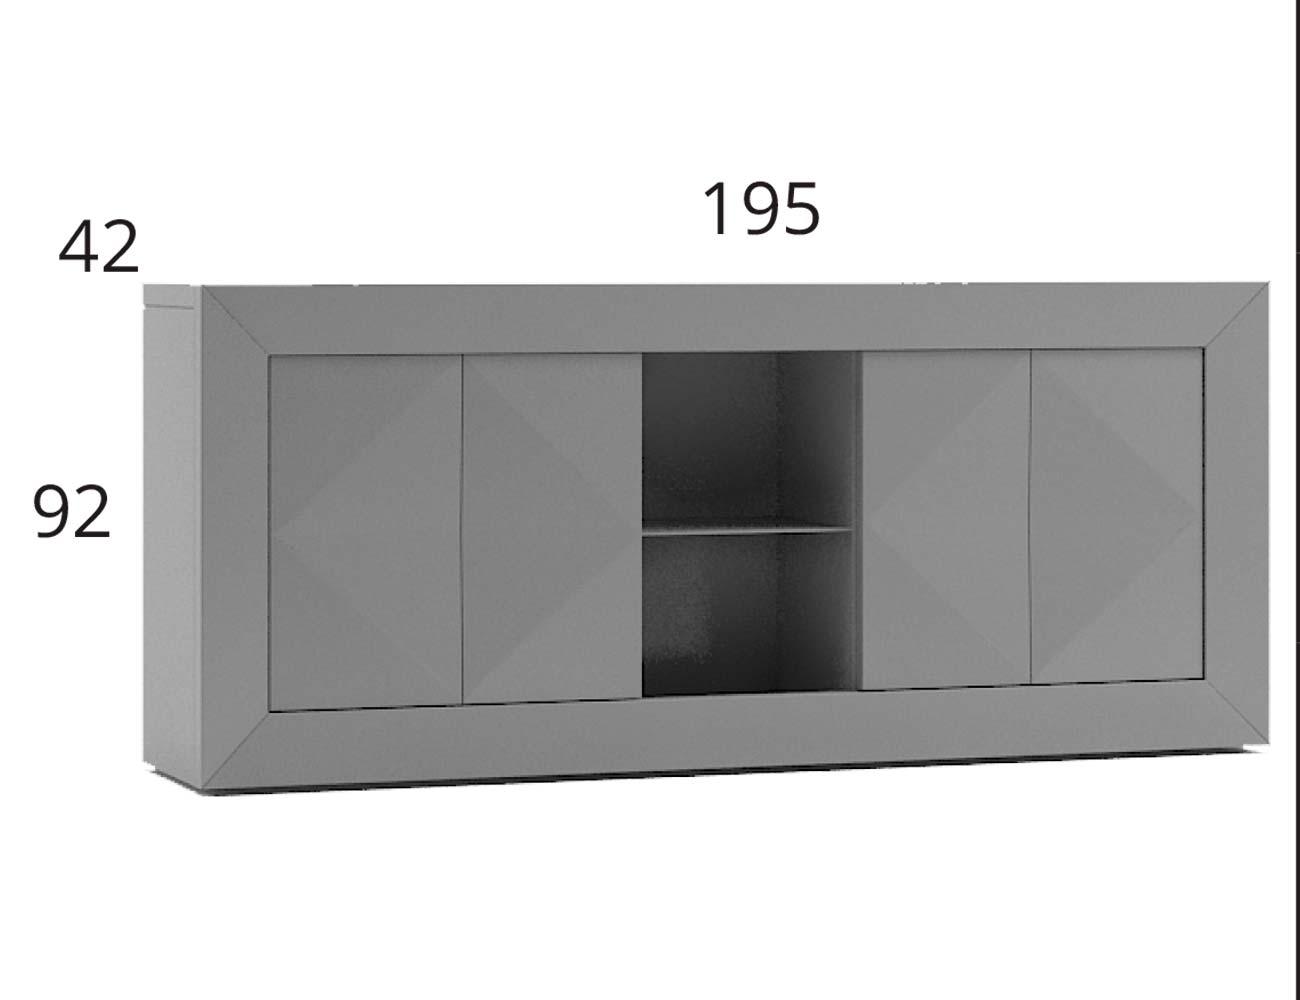 A0352